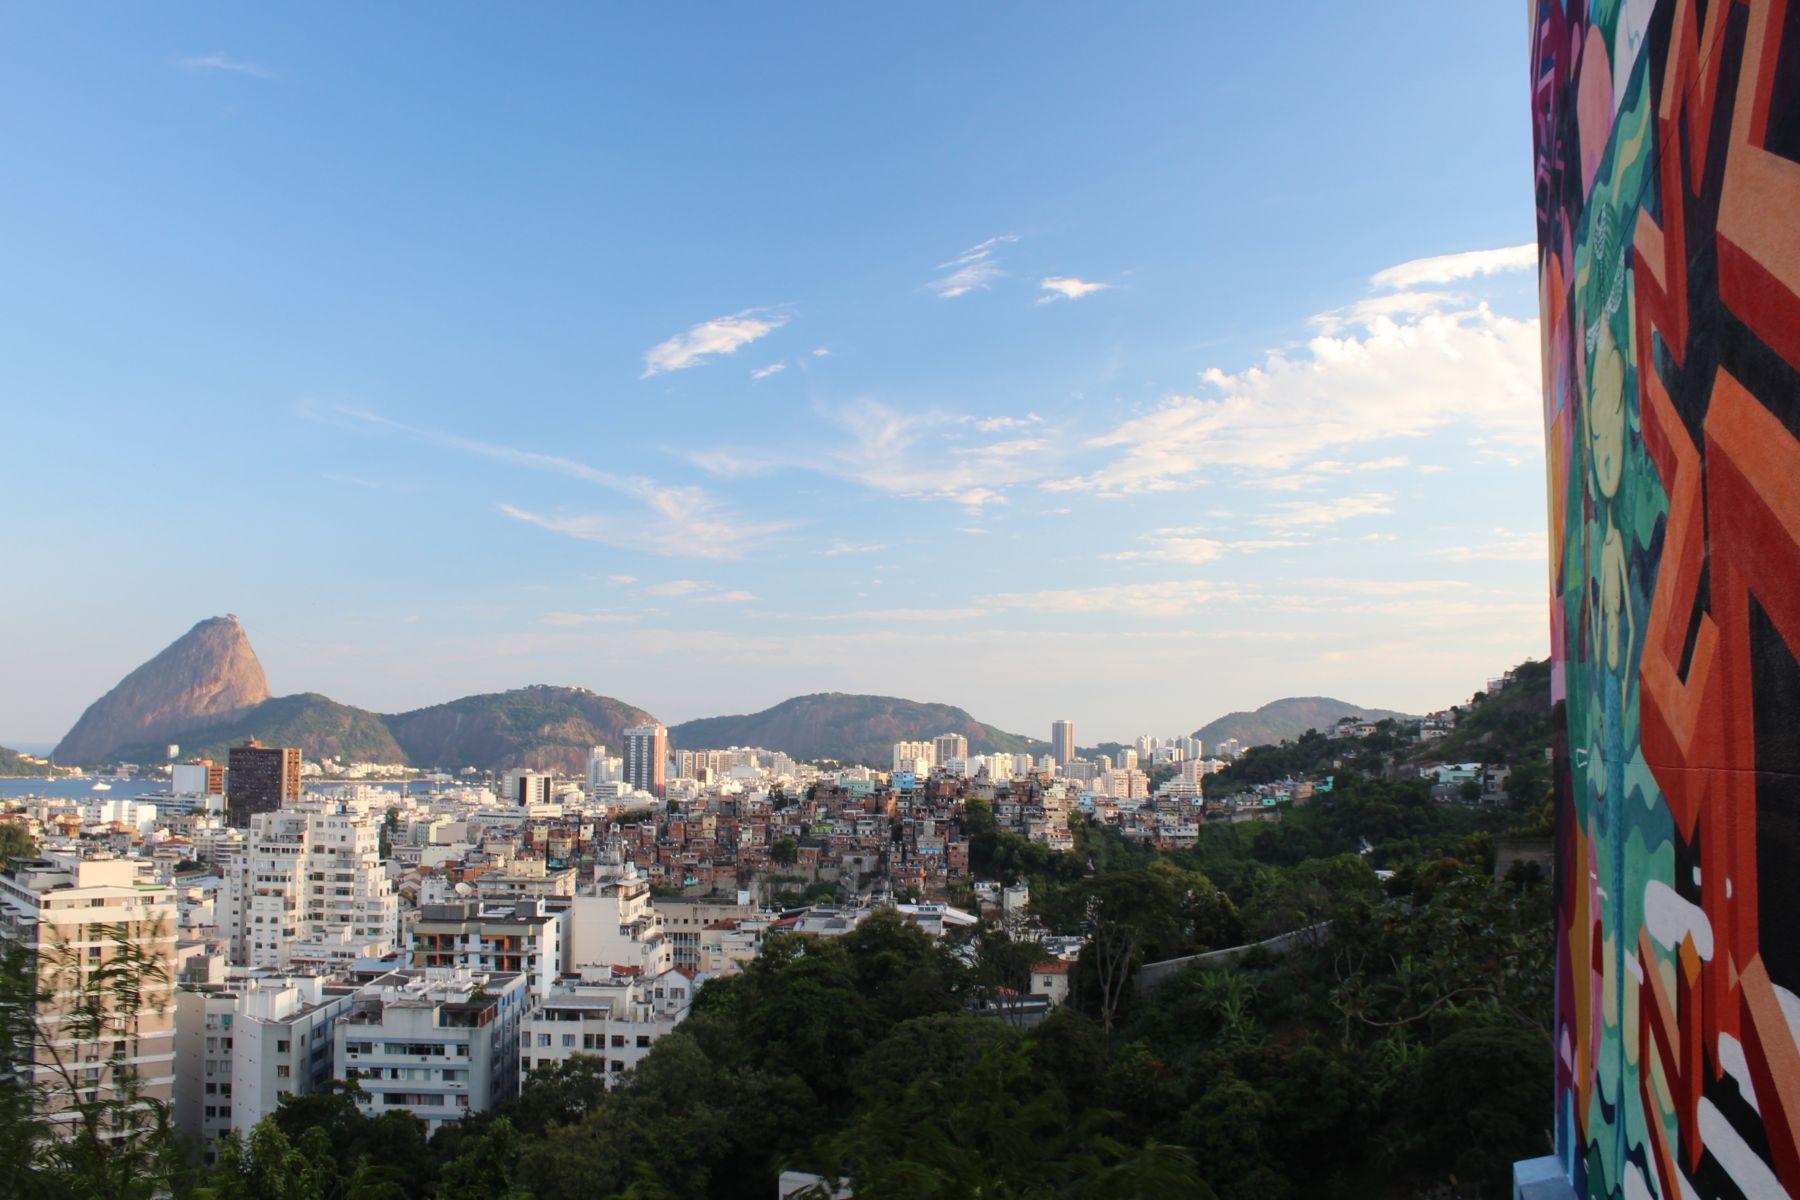 View of Rio from the Bohemian neighborhood of Santa Teresa.